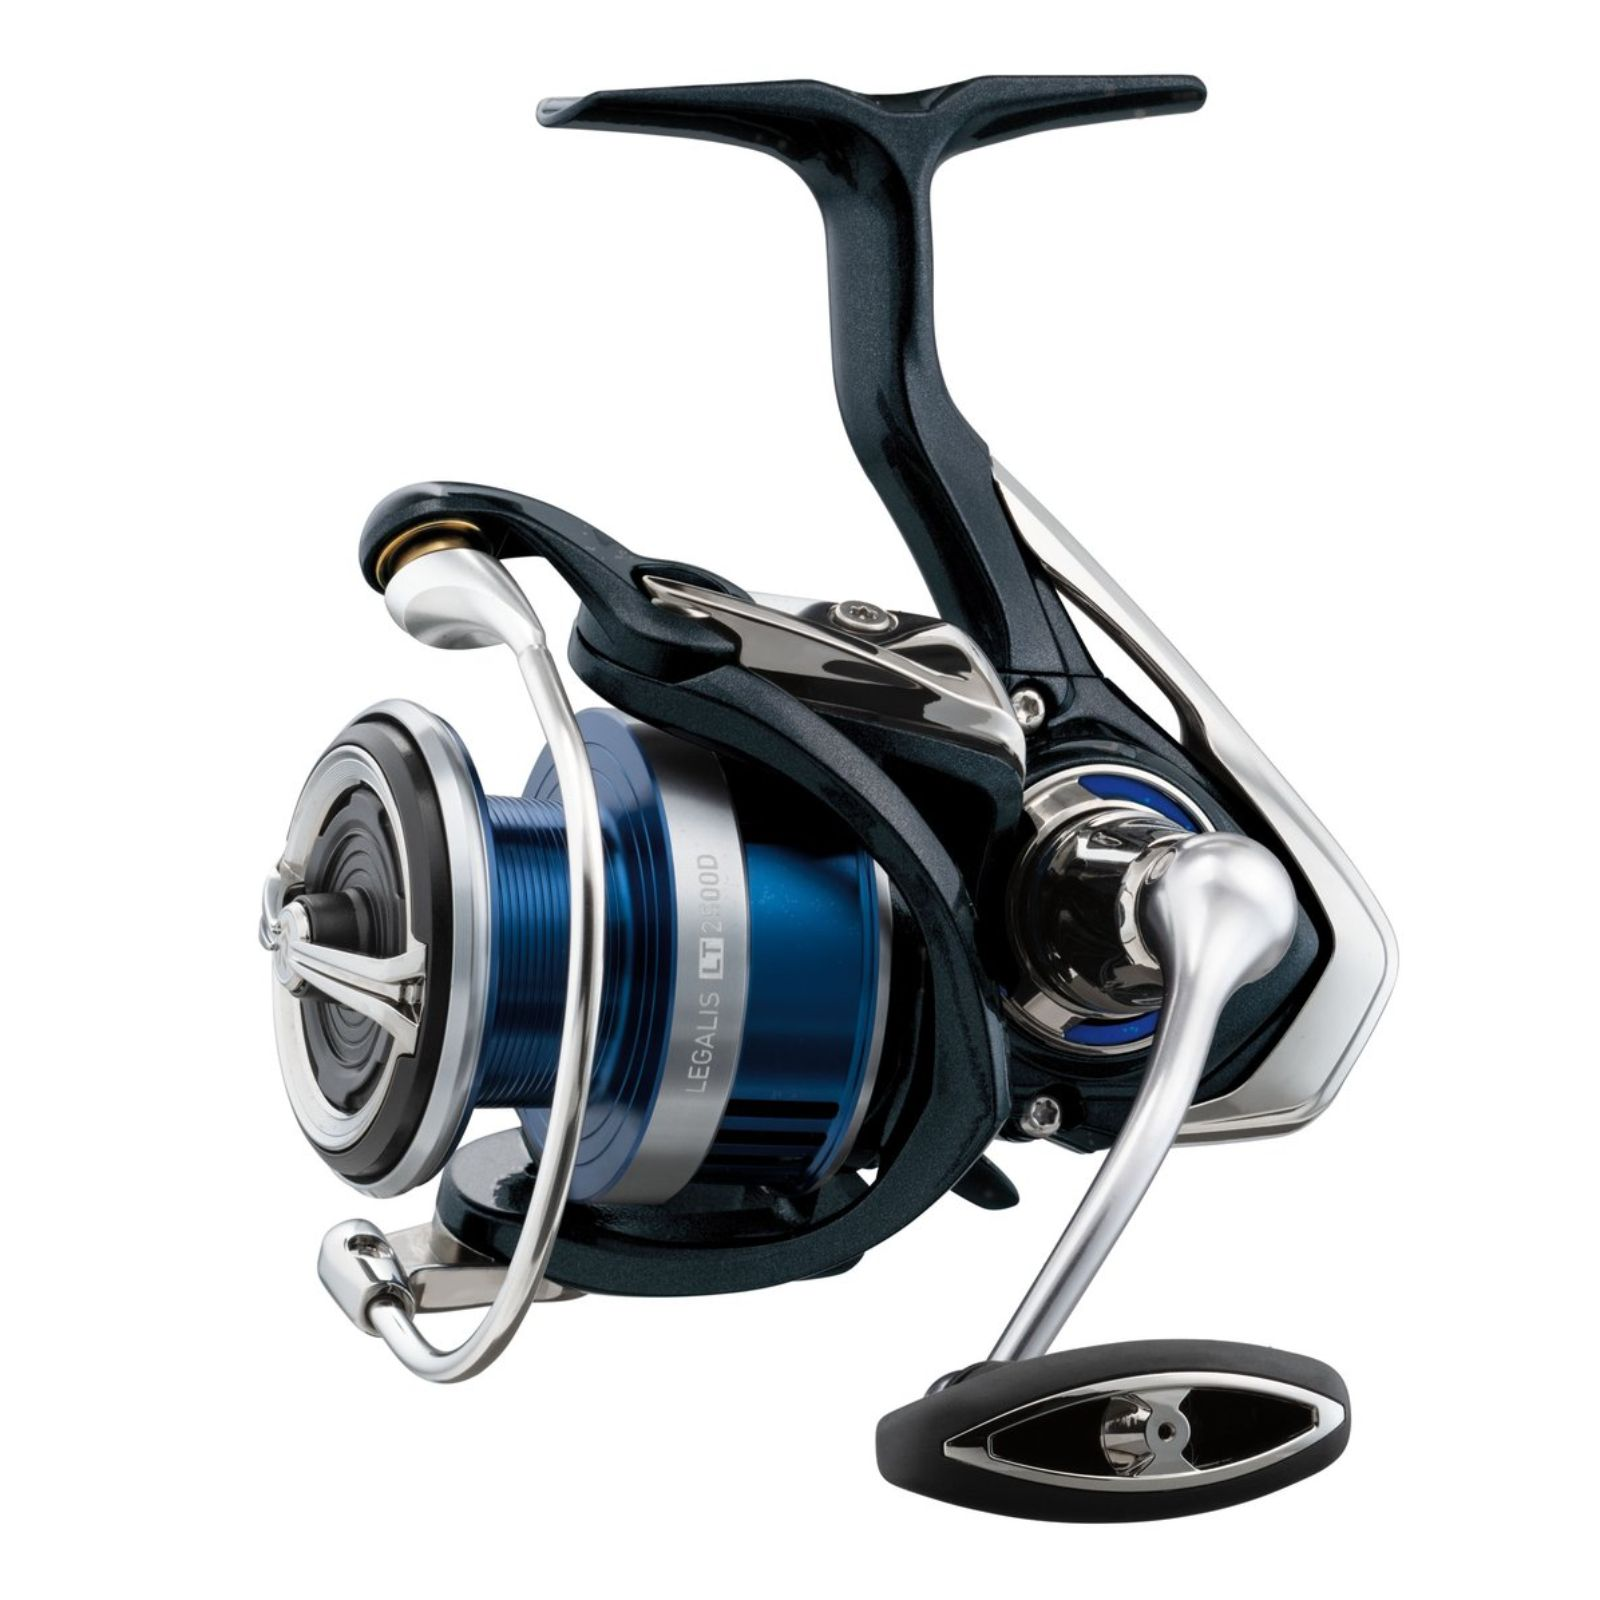 Daiwa Legalis LT 3000D-C Spinning Reel